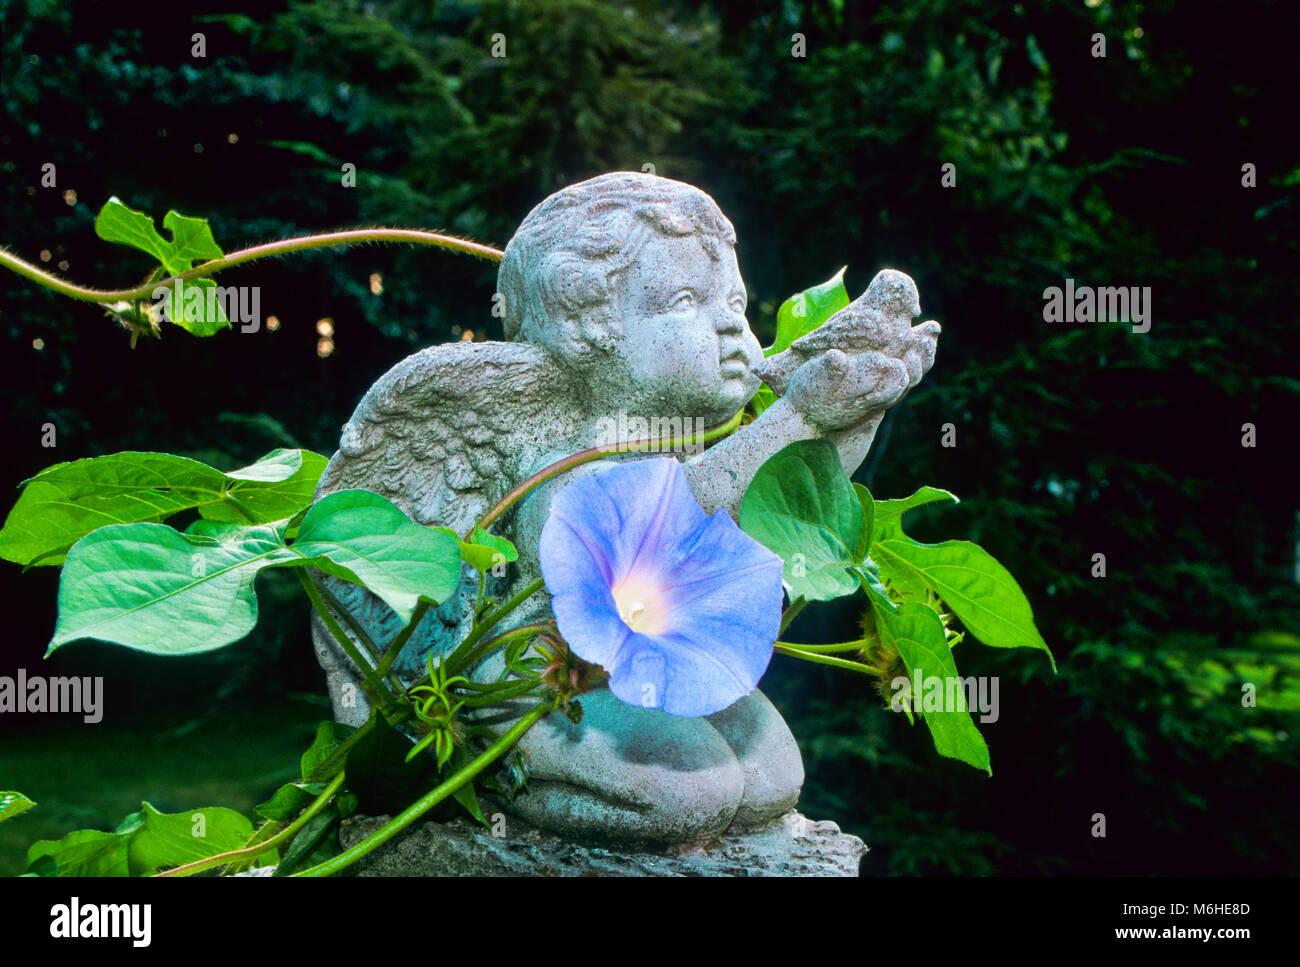 Angel garden figurine with Heavenly blue Morning Glory vine twining, New Jersey, USa - Stock Image